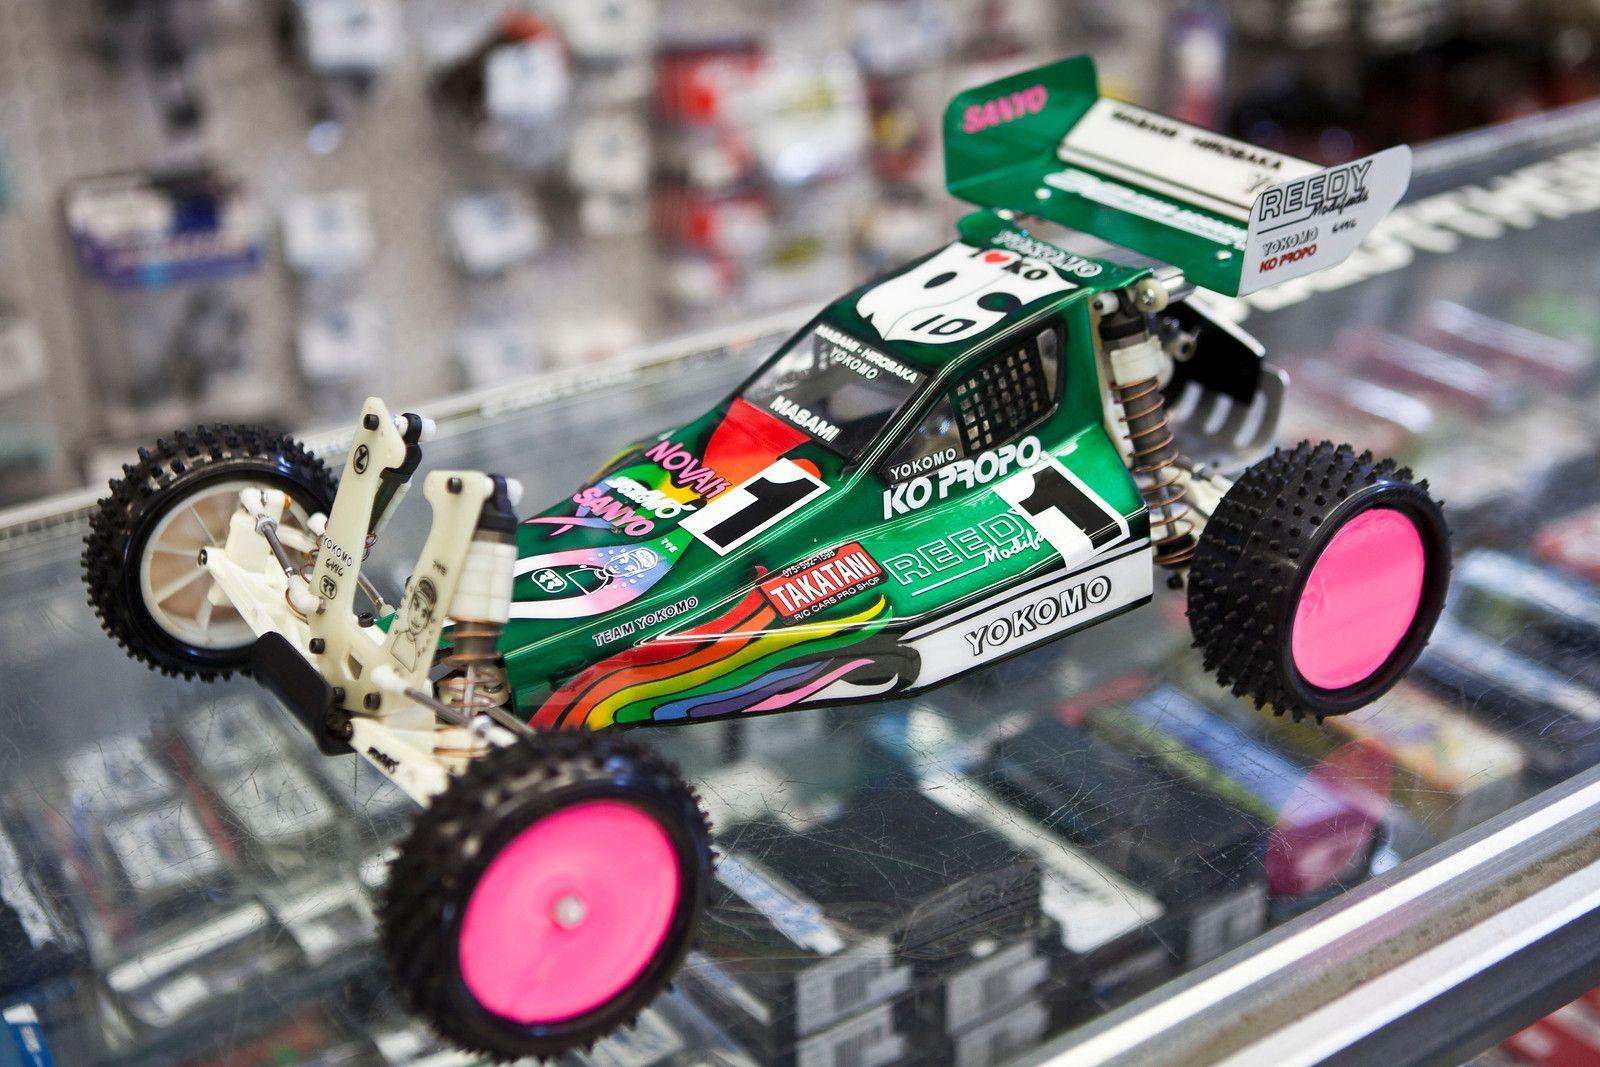 Anyone screw around with RC Cars? Made impulse buy